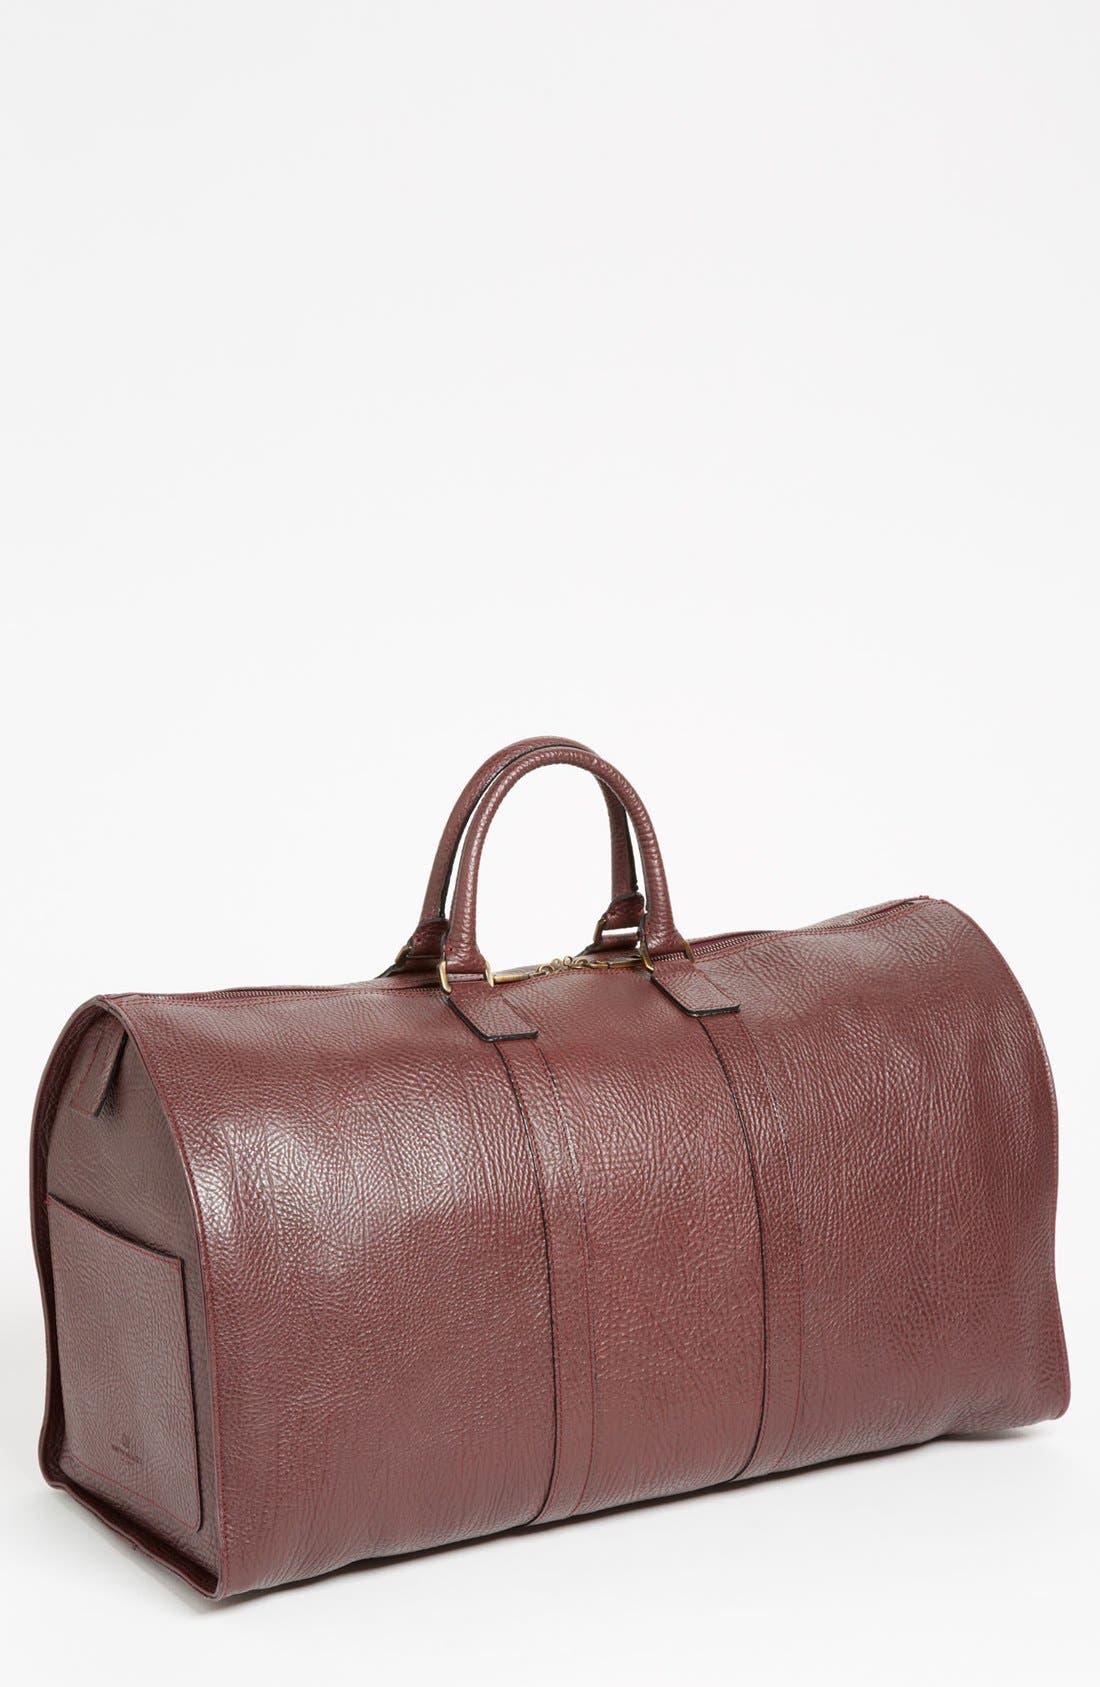 Main Image - Bruno Magli 'Anselmo' Calfskin Duffel Bag